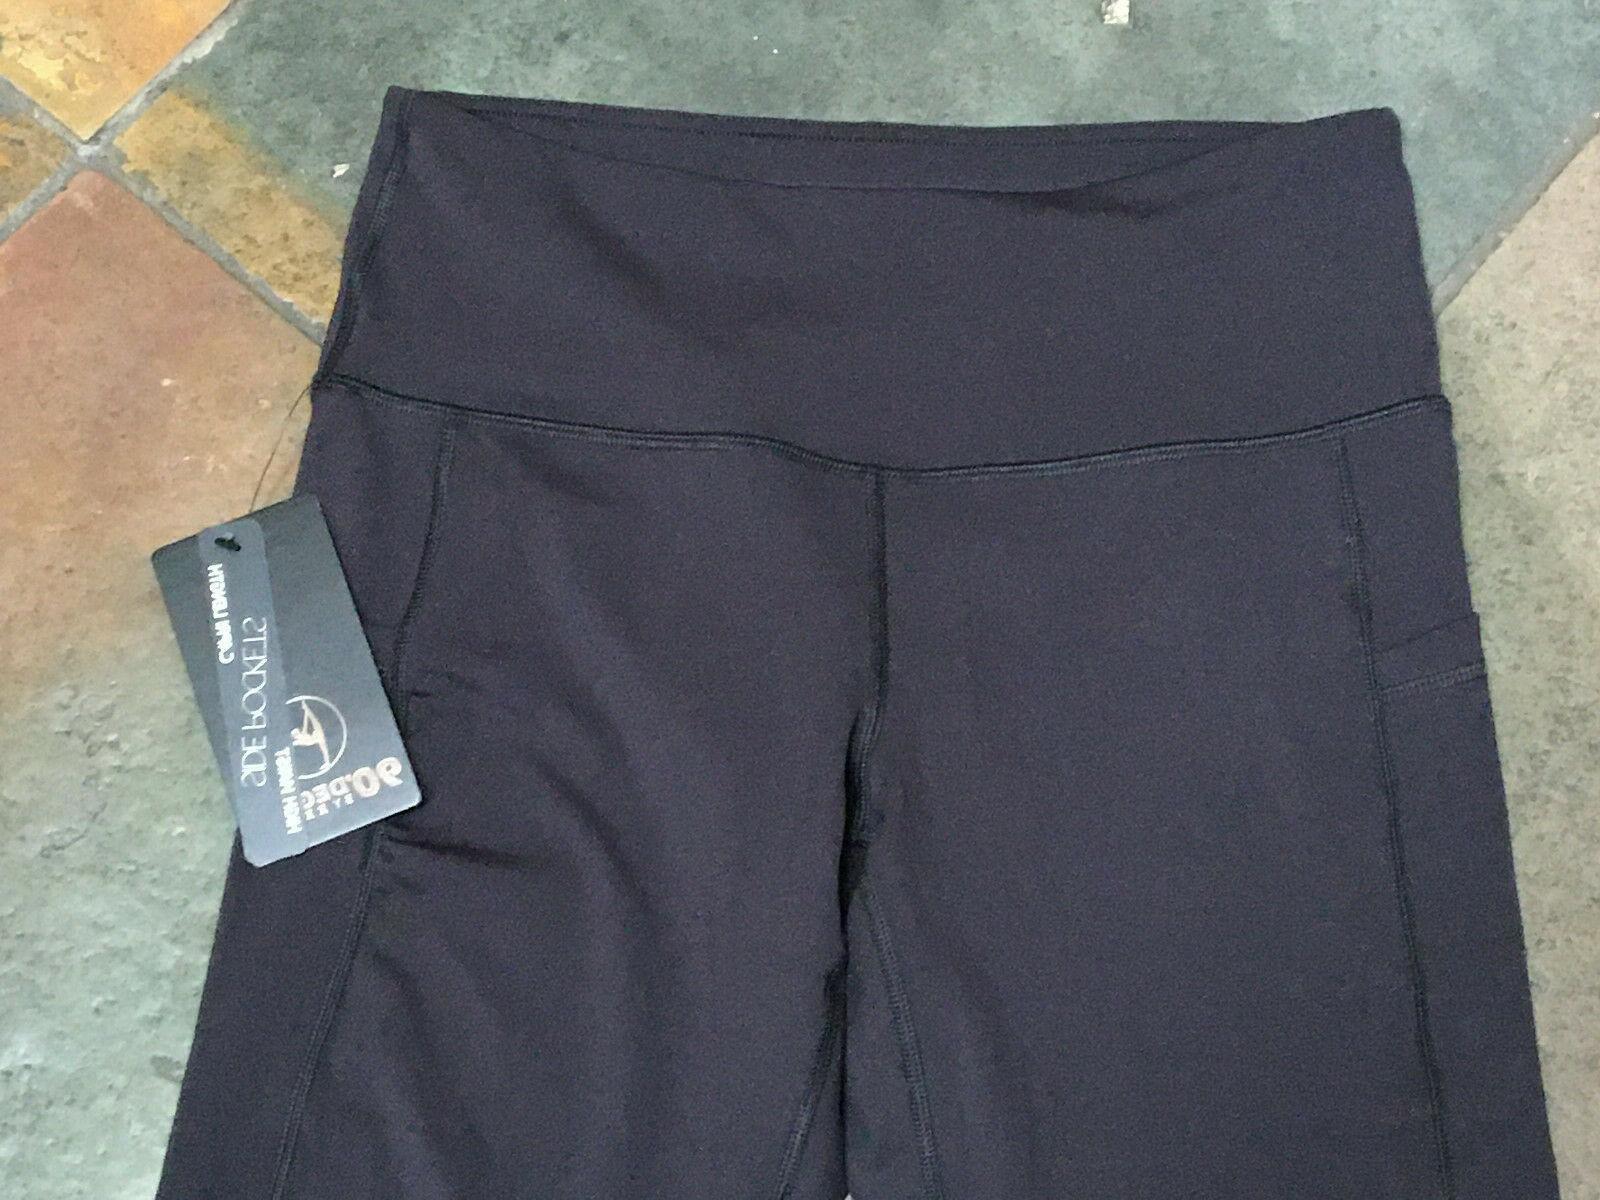 0920 90 Degree Reflex Waist Capri W Pockets #CW62391 NWT B